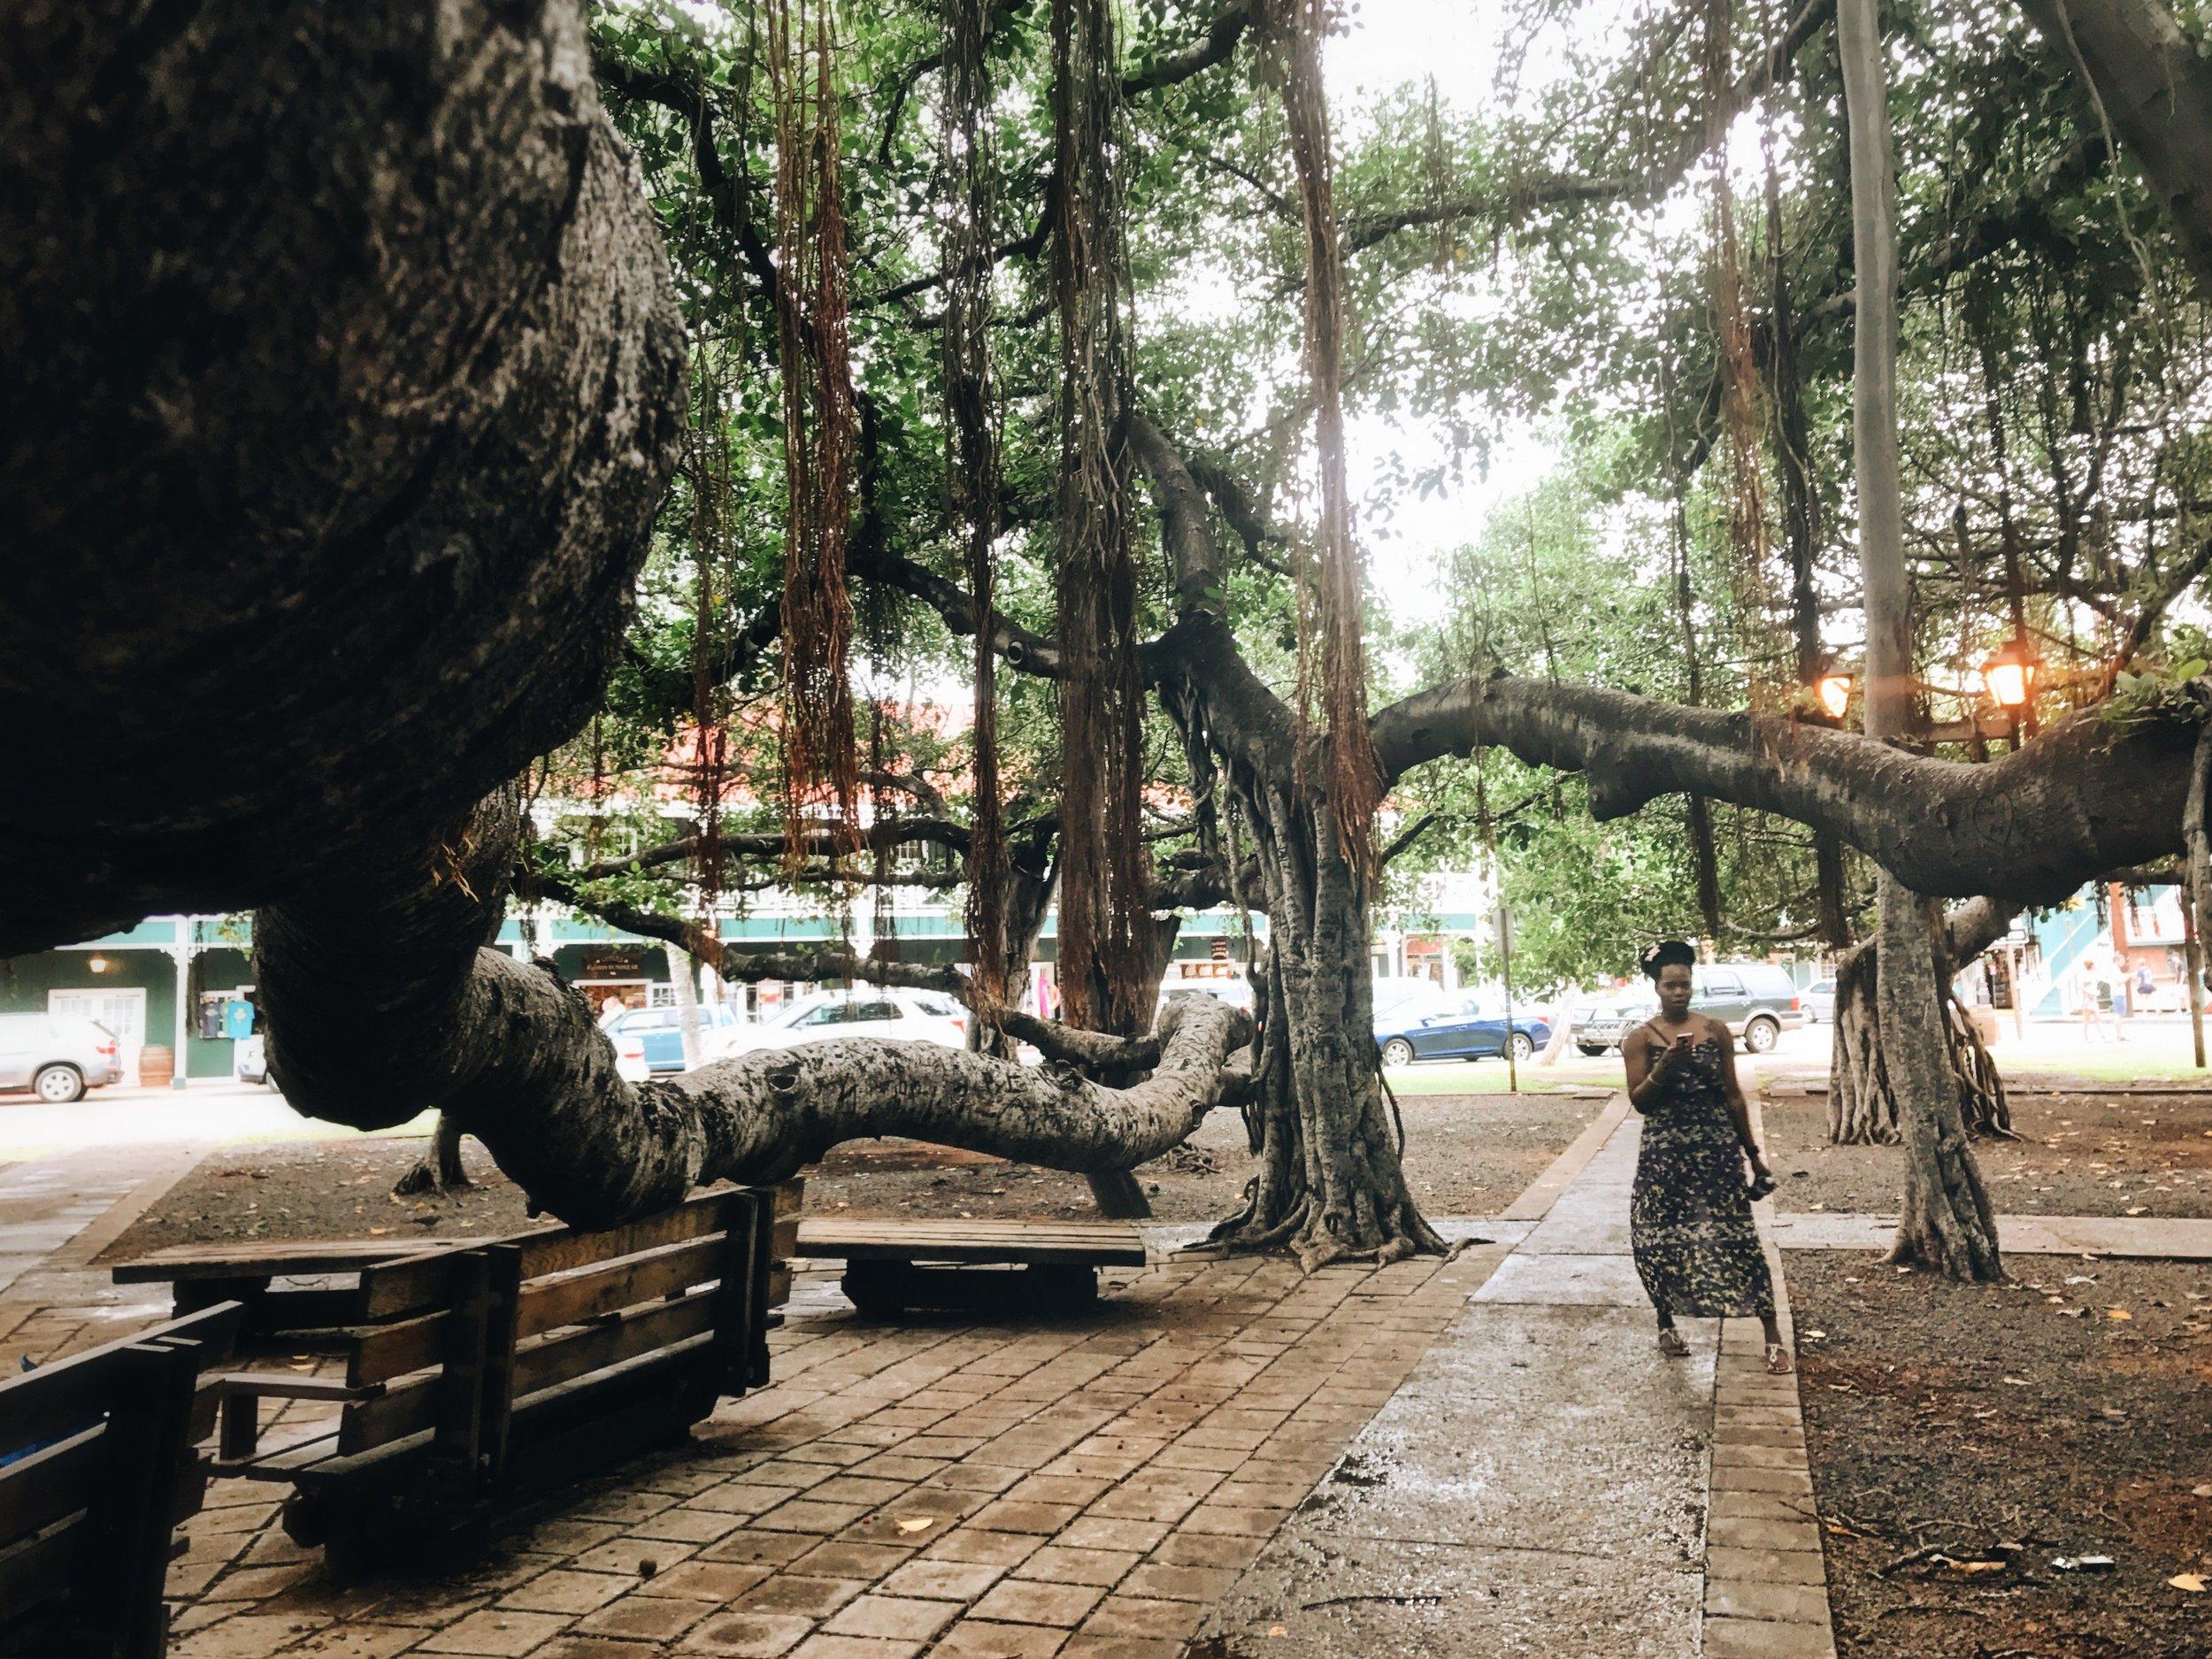 Hawaii-Lahaina-largest-banyan-tree-by-Atlanta-photographer-Chanel-French-22